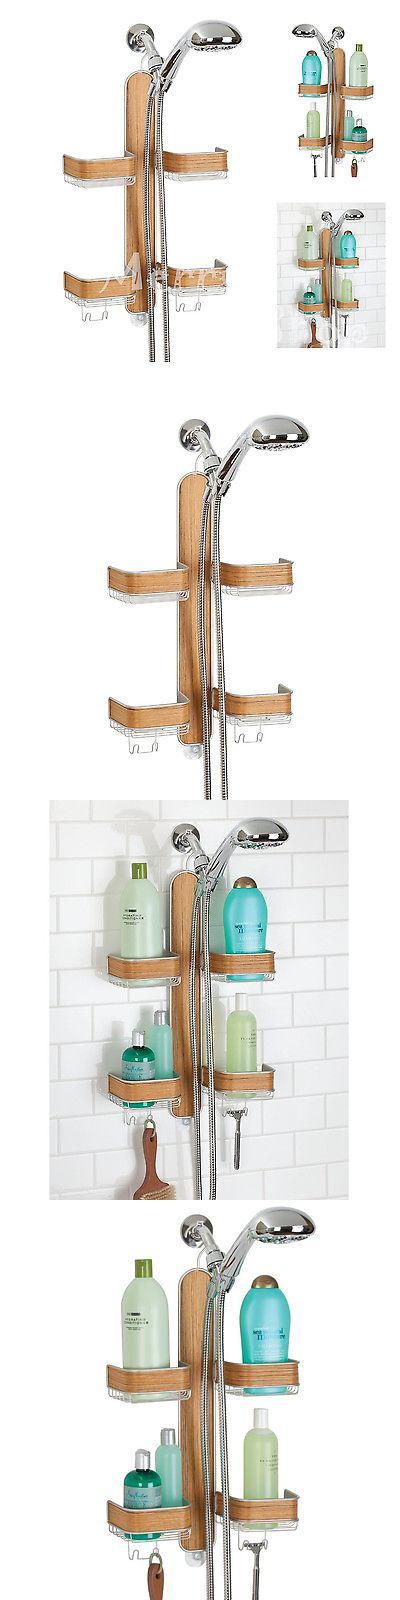 Bath Caddies and Storage 54075: Bamboo Shower Caddy Bathroom Shelves ...